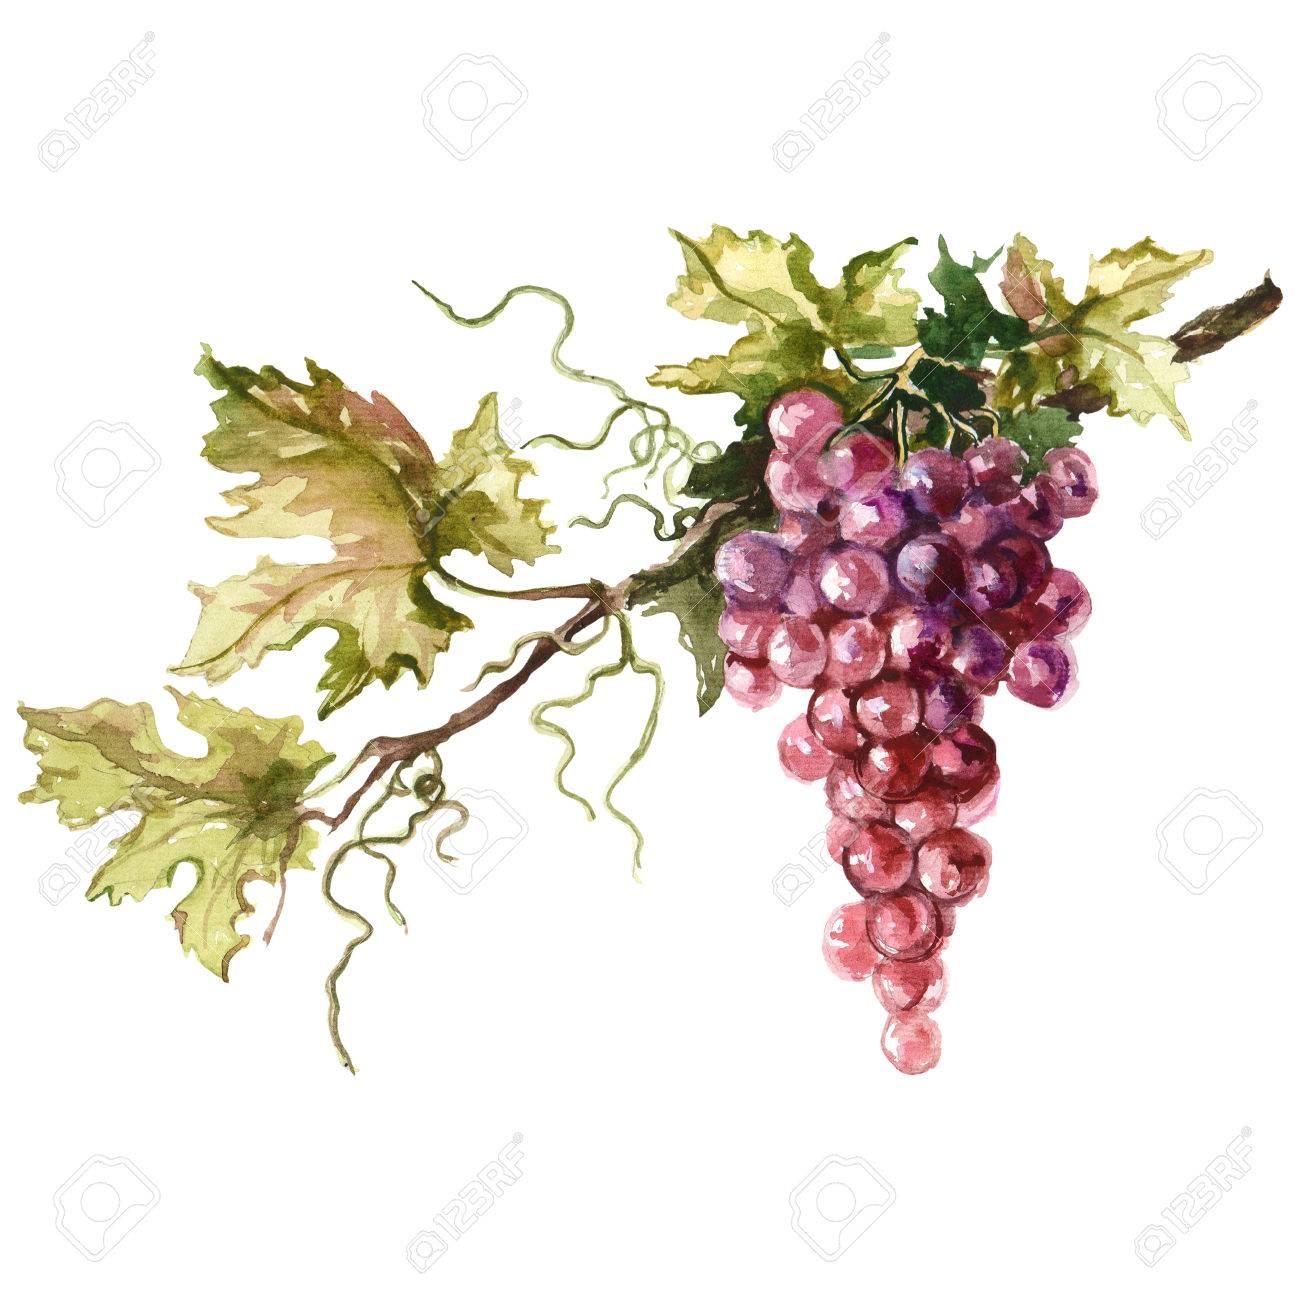 Watercolor illustration of grape branch. Raster design element. - 67056481